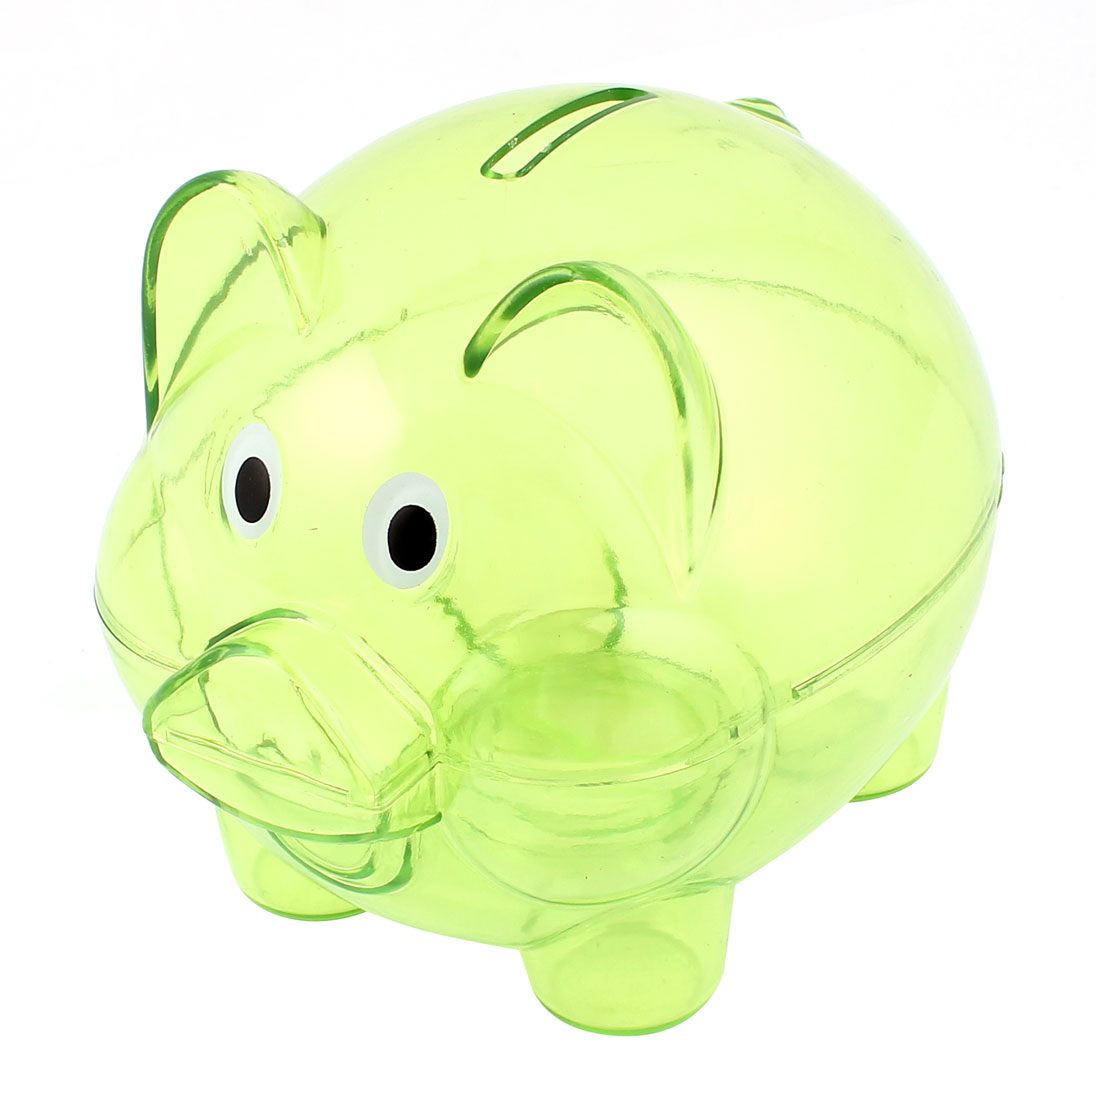 Clear Green Plastic Collectible Piggy Bank Coin Savings Saver Money Cash Collection Safe Box Case